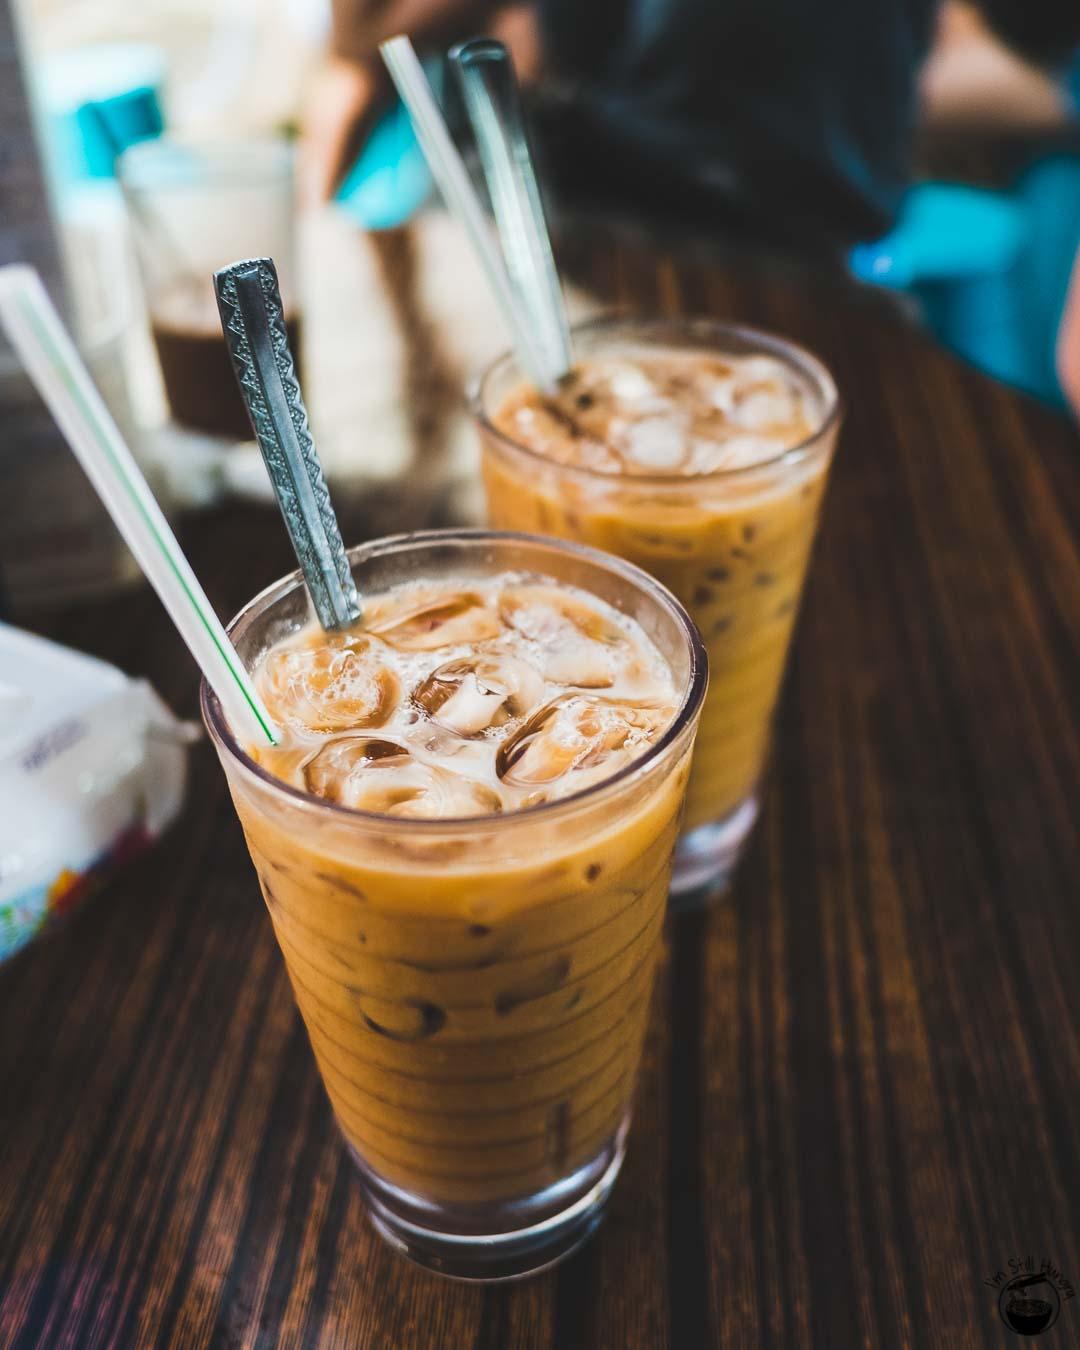 Yue Hing Hong Kong Yuan yang (HK milk tea + coffee hybrid drink)